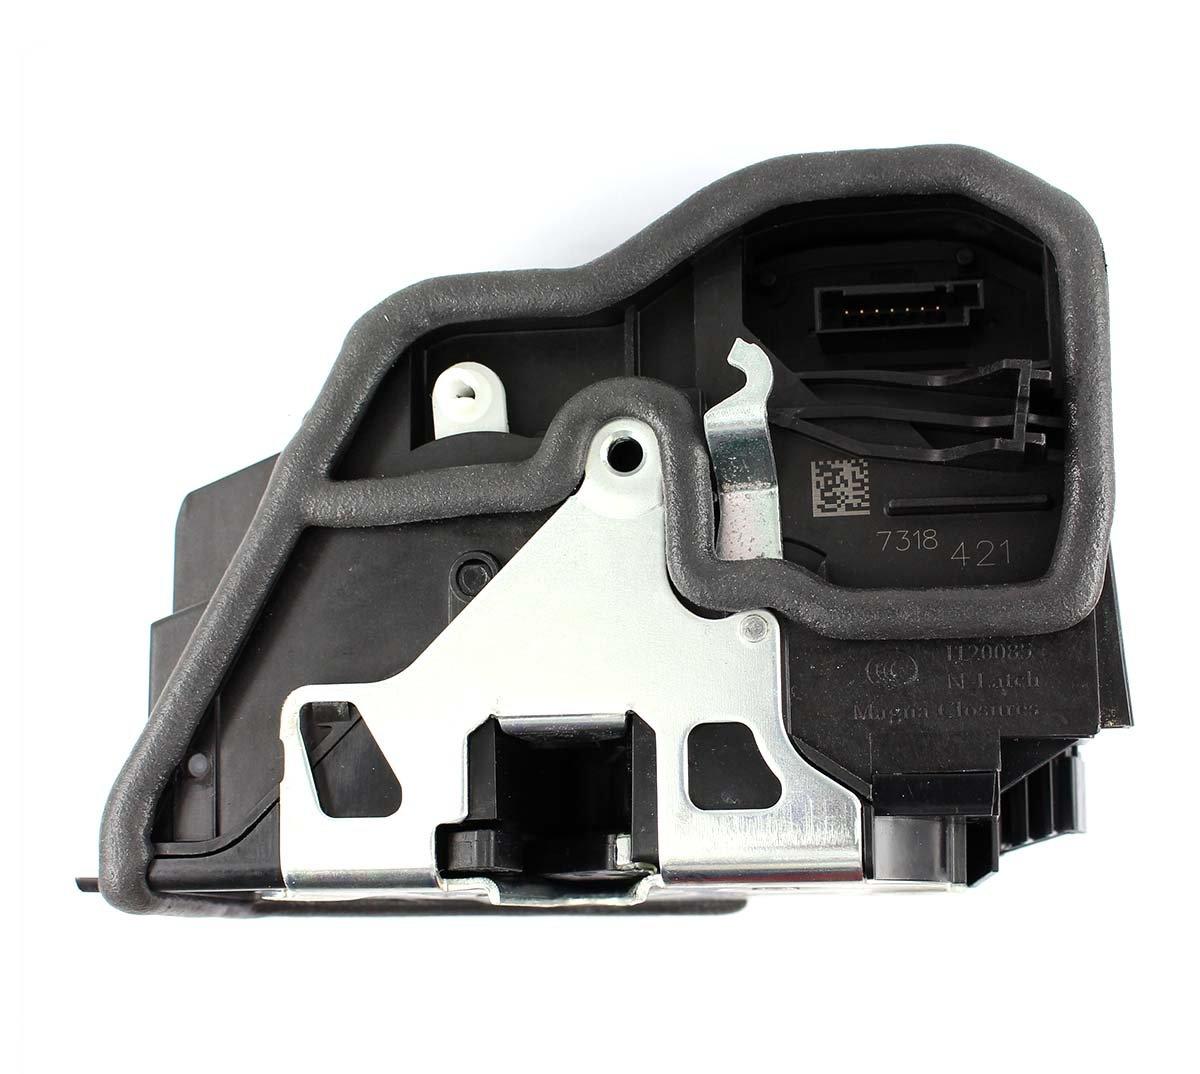 BMW Alpina B7 >> Front Door Lock Actuator Mechanism Left Driver Side For BMW Replace 51217202143 | eBay